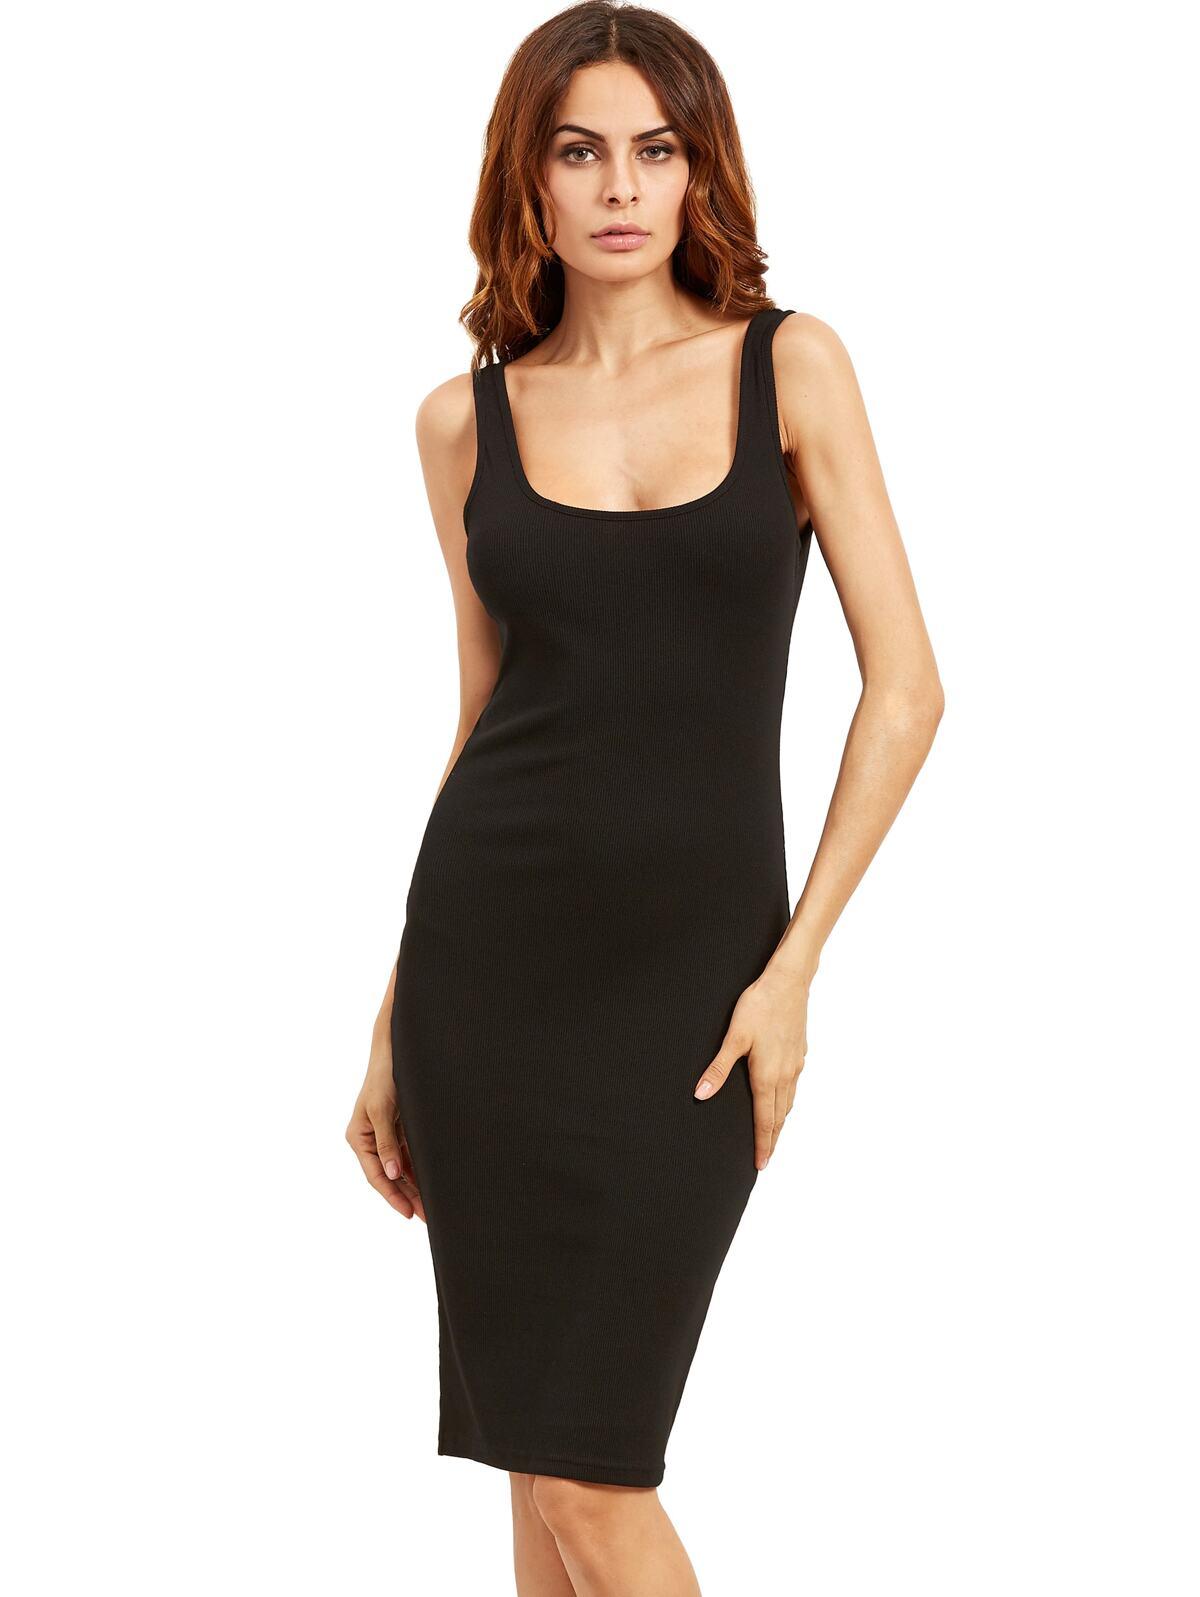 Black Sleeveless U Neck Bodycon Dress